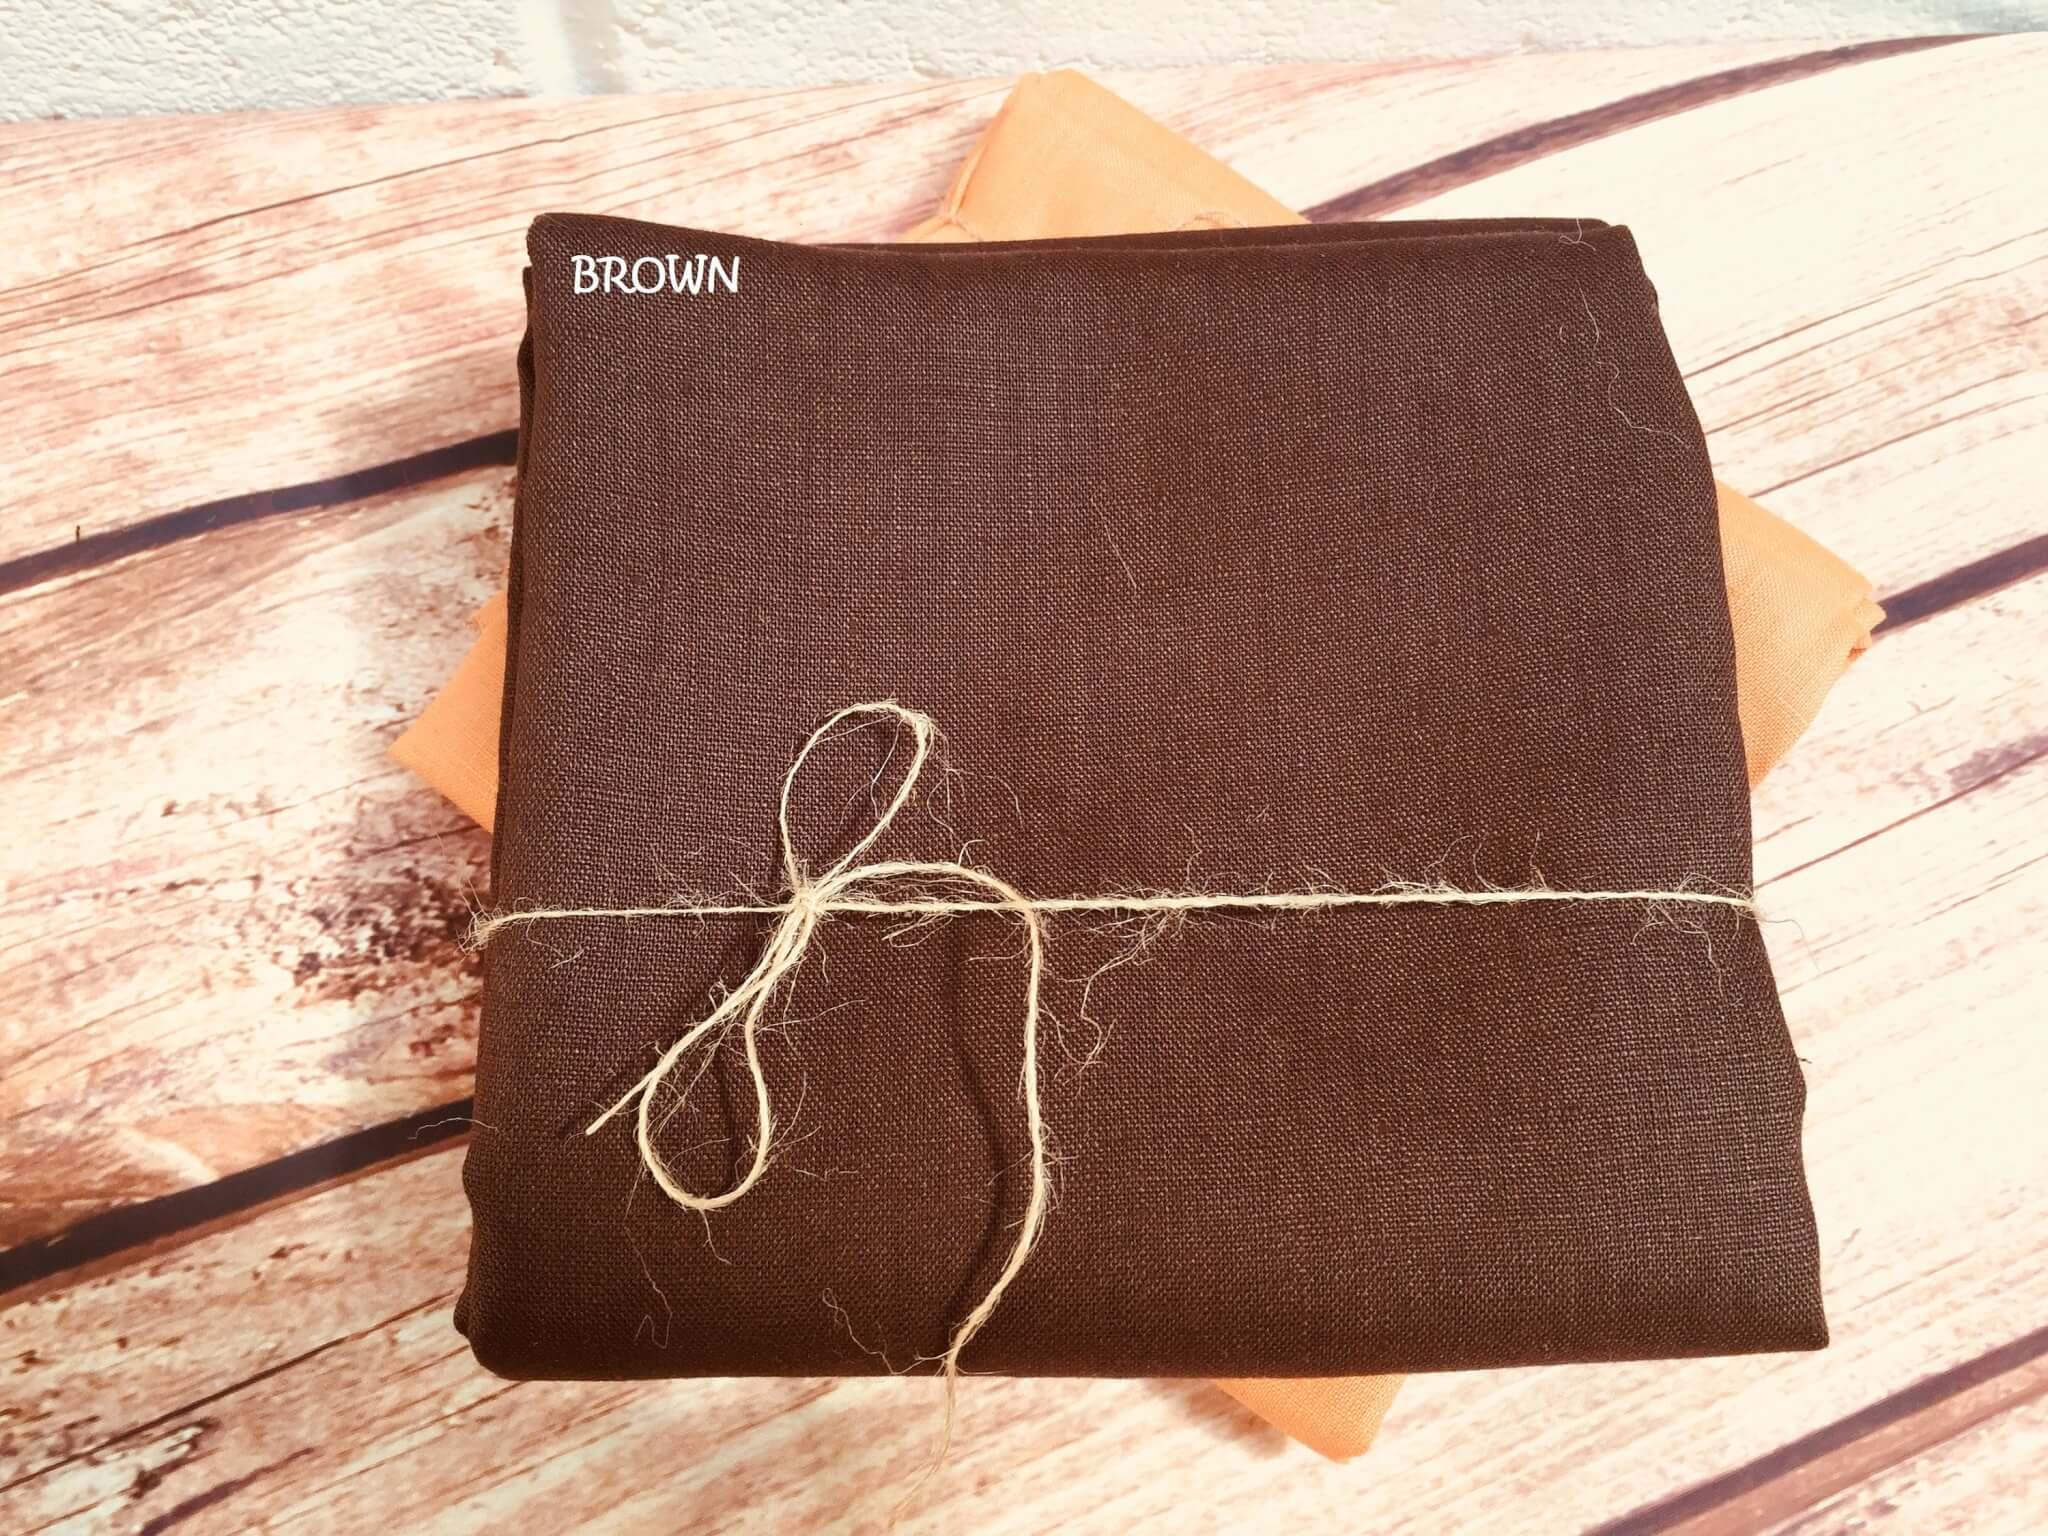 soft-linen-fabric-material-100-linens-textile-for-home-decor-curtains-clothes-140cm-wide-plain-brown-5d73f2f81.jpg